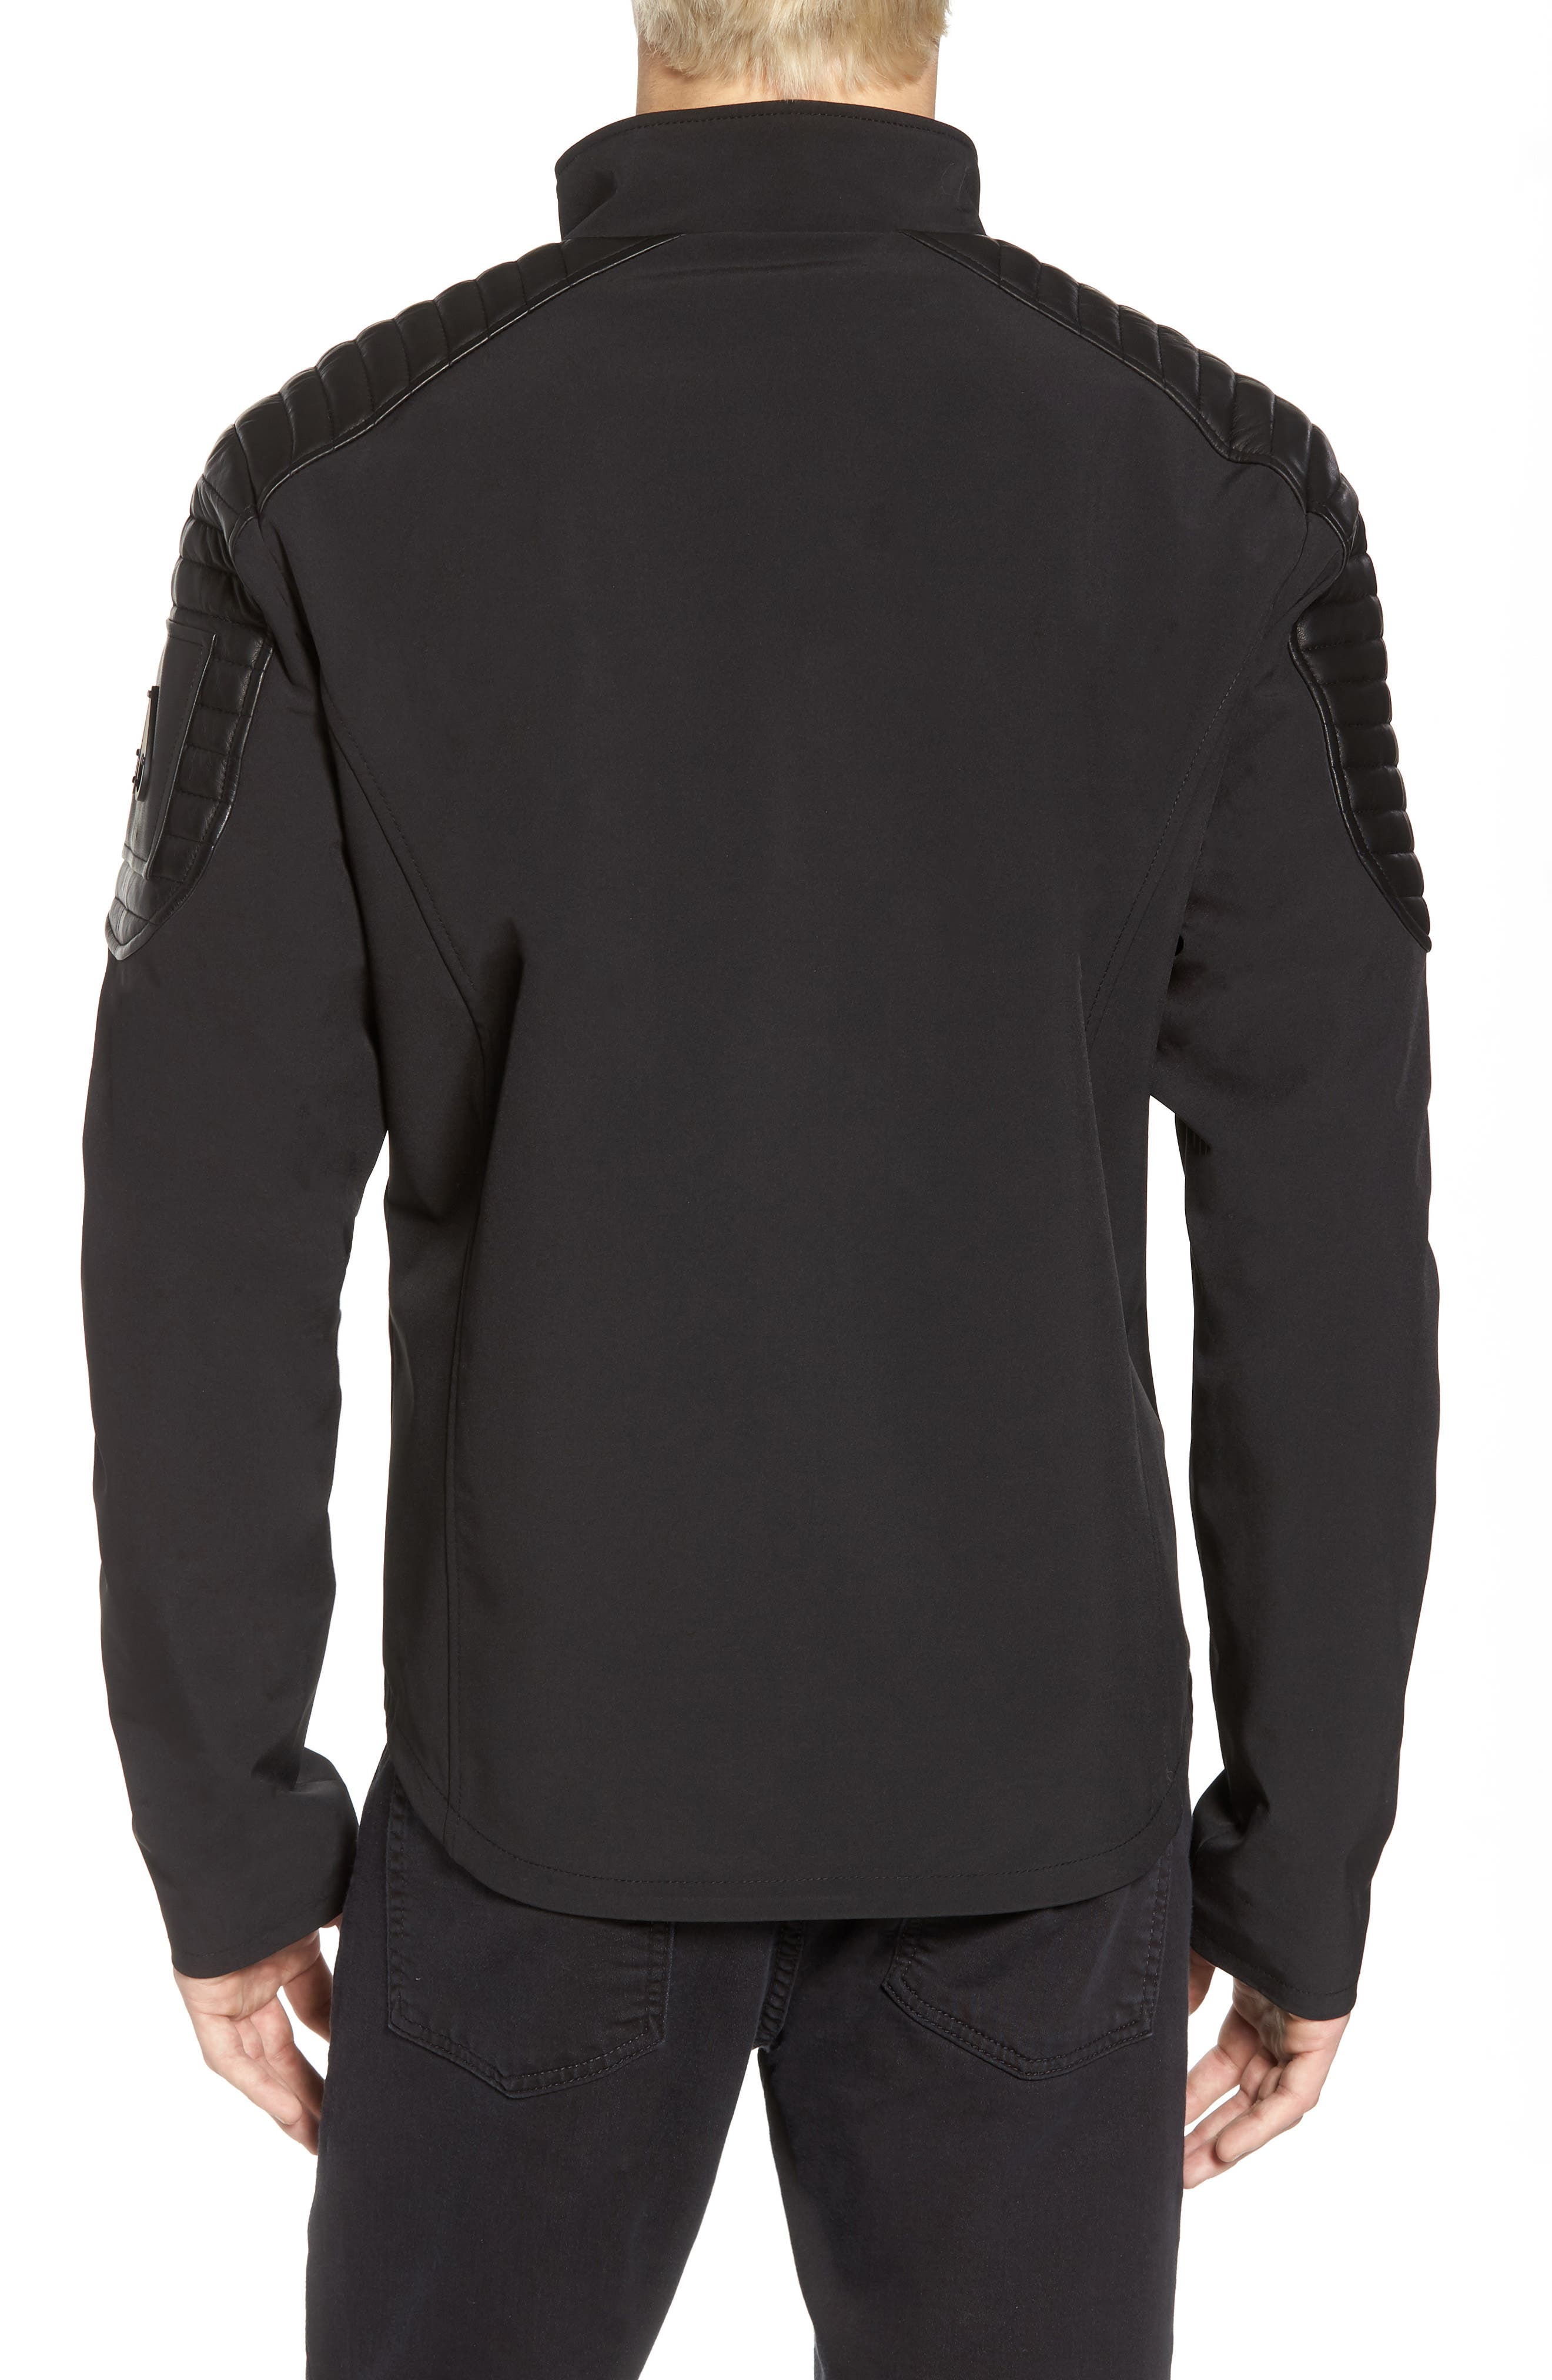 Grindstone Water Repellent Jacket,                             Alternate thumbnail 2, color,                             Black